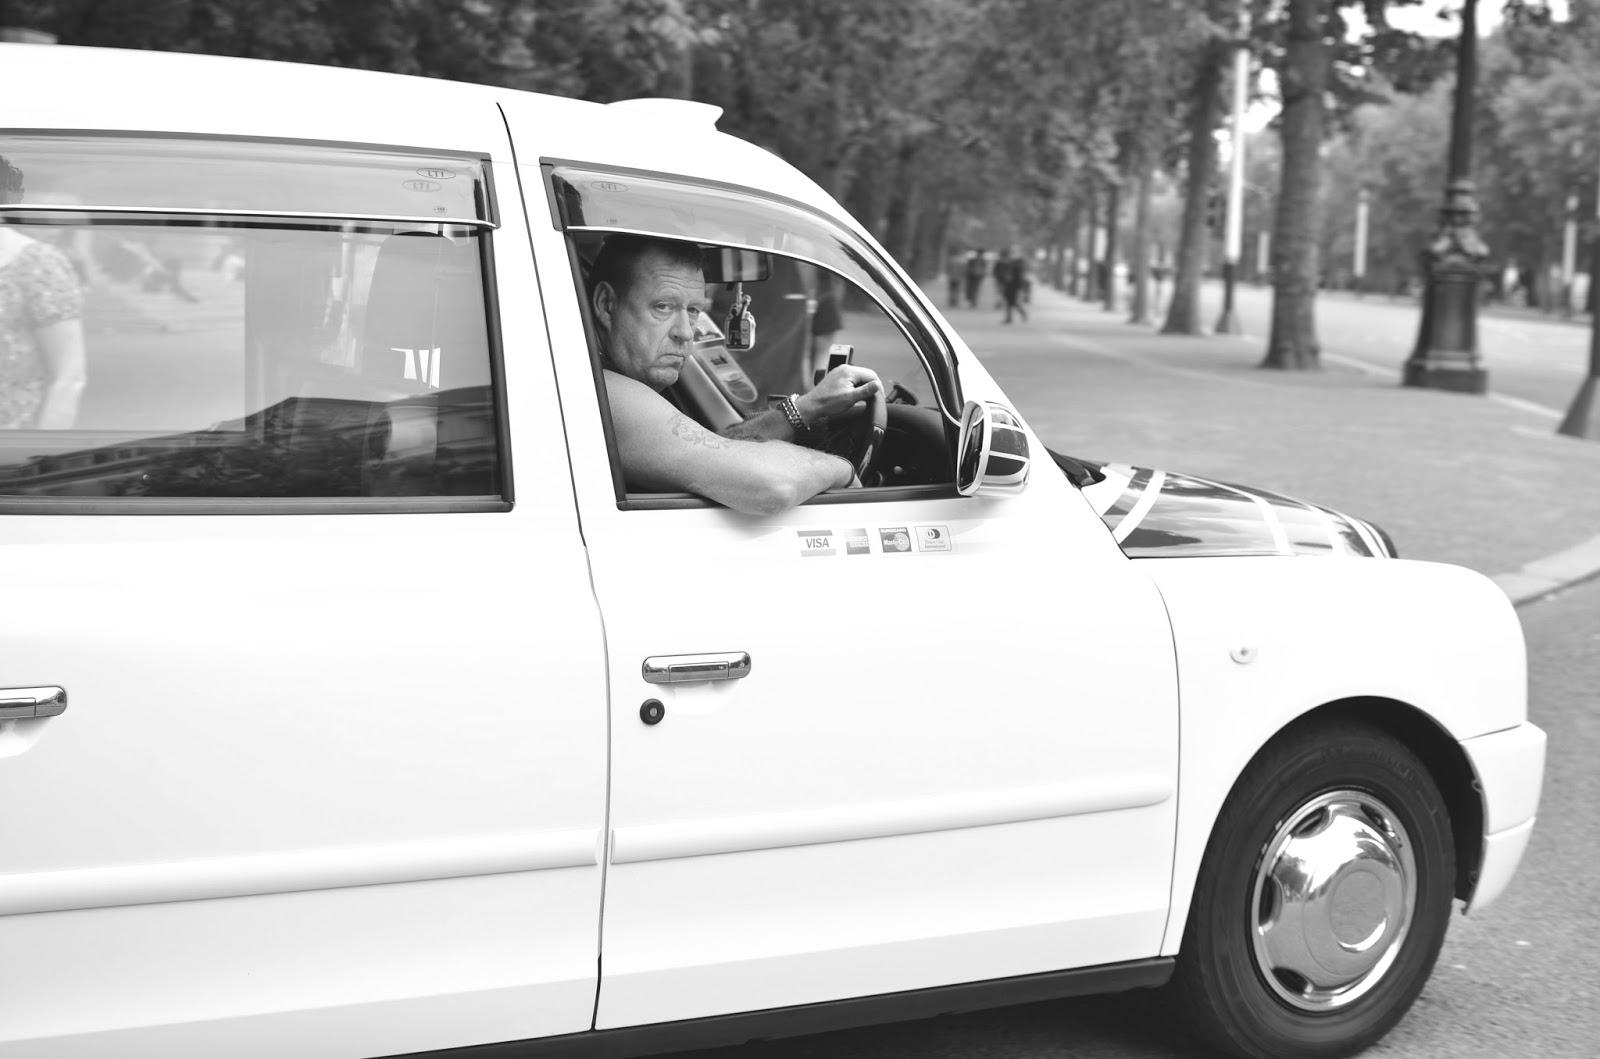 london, glasgow photographer, scottish photographer, photography, london, london cabbie, iconic, black and white photography,